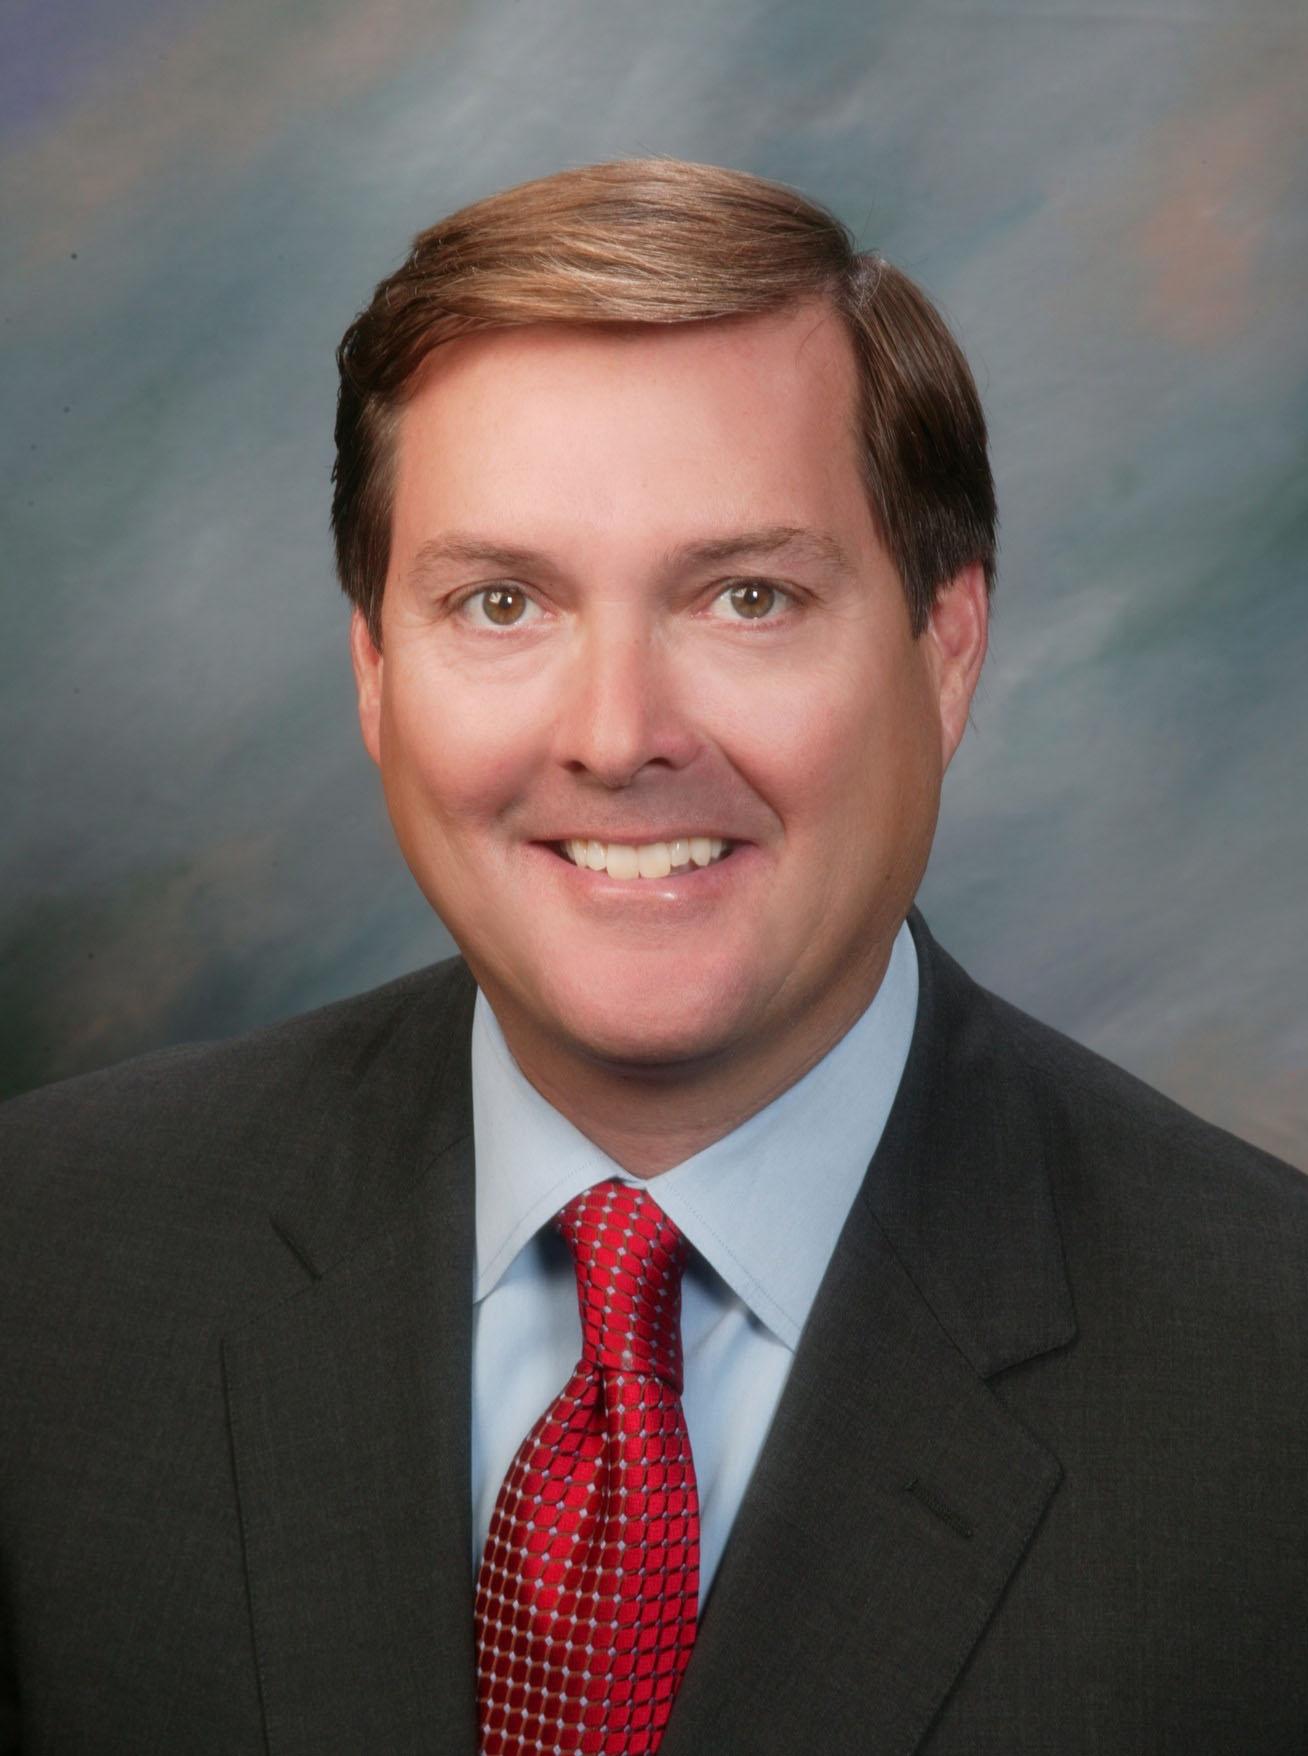 Dana Point City Council member Bill Brough